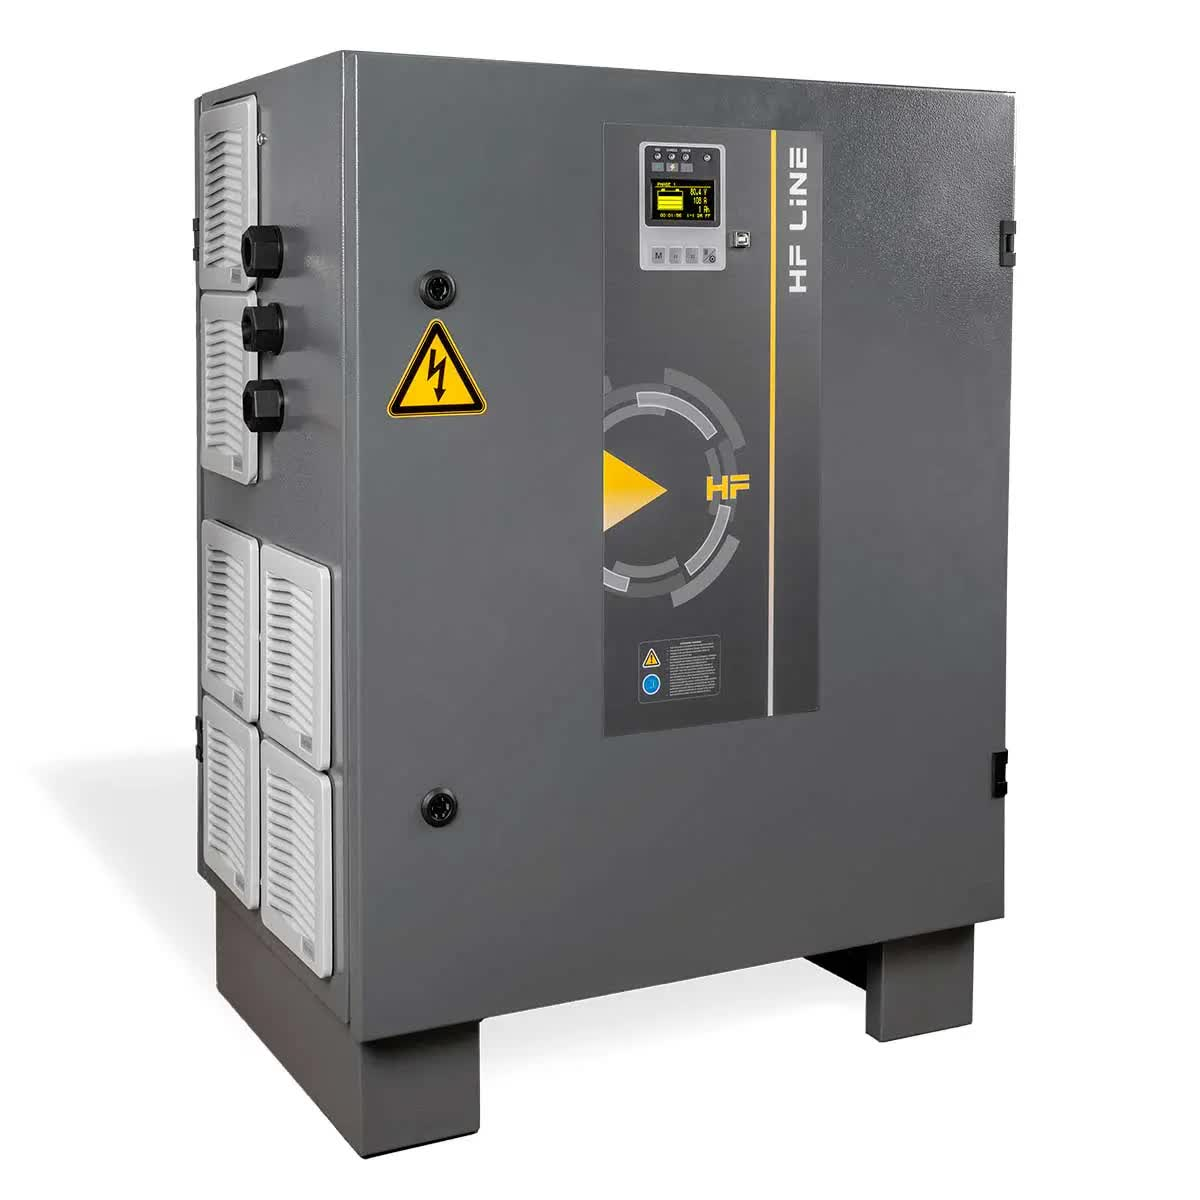 cargadores para litio, Brescia, Italia, ATIB Elettronica